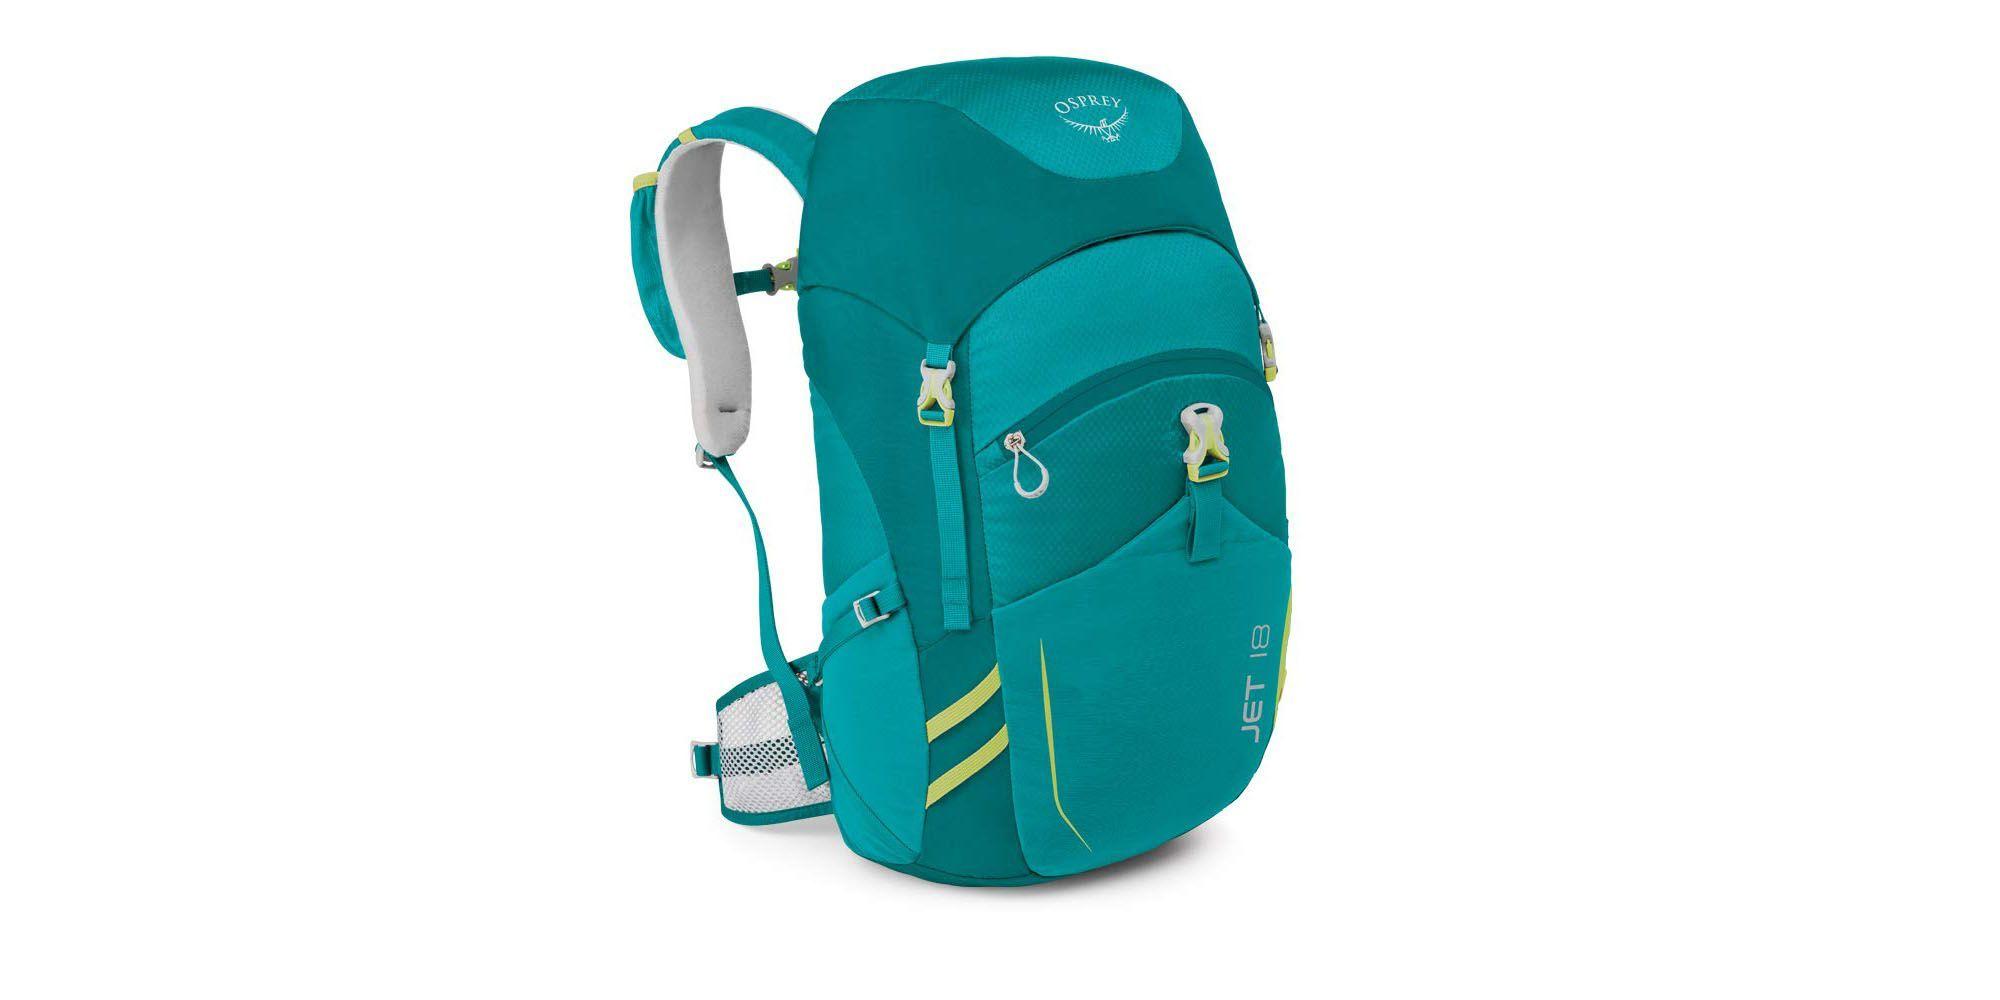 new styles eca20 90a55 Osprey Packs Jet 18 Kids Backpack